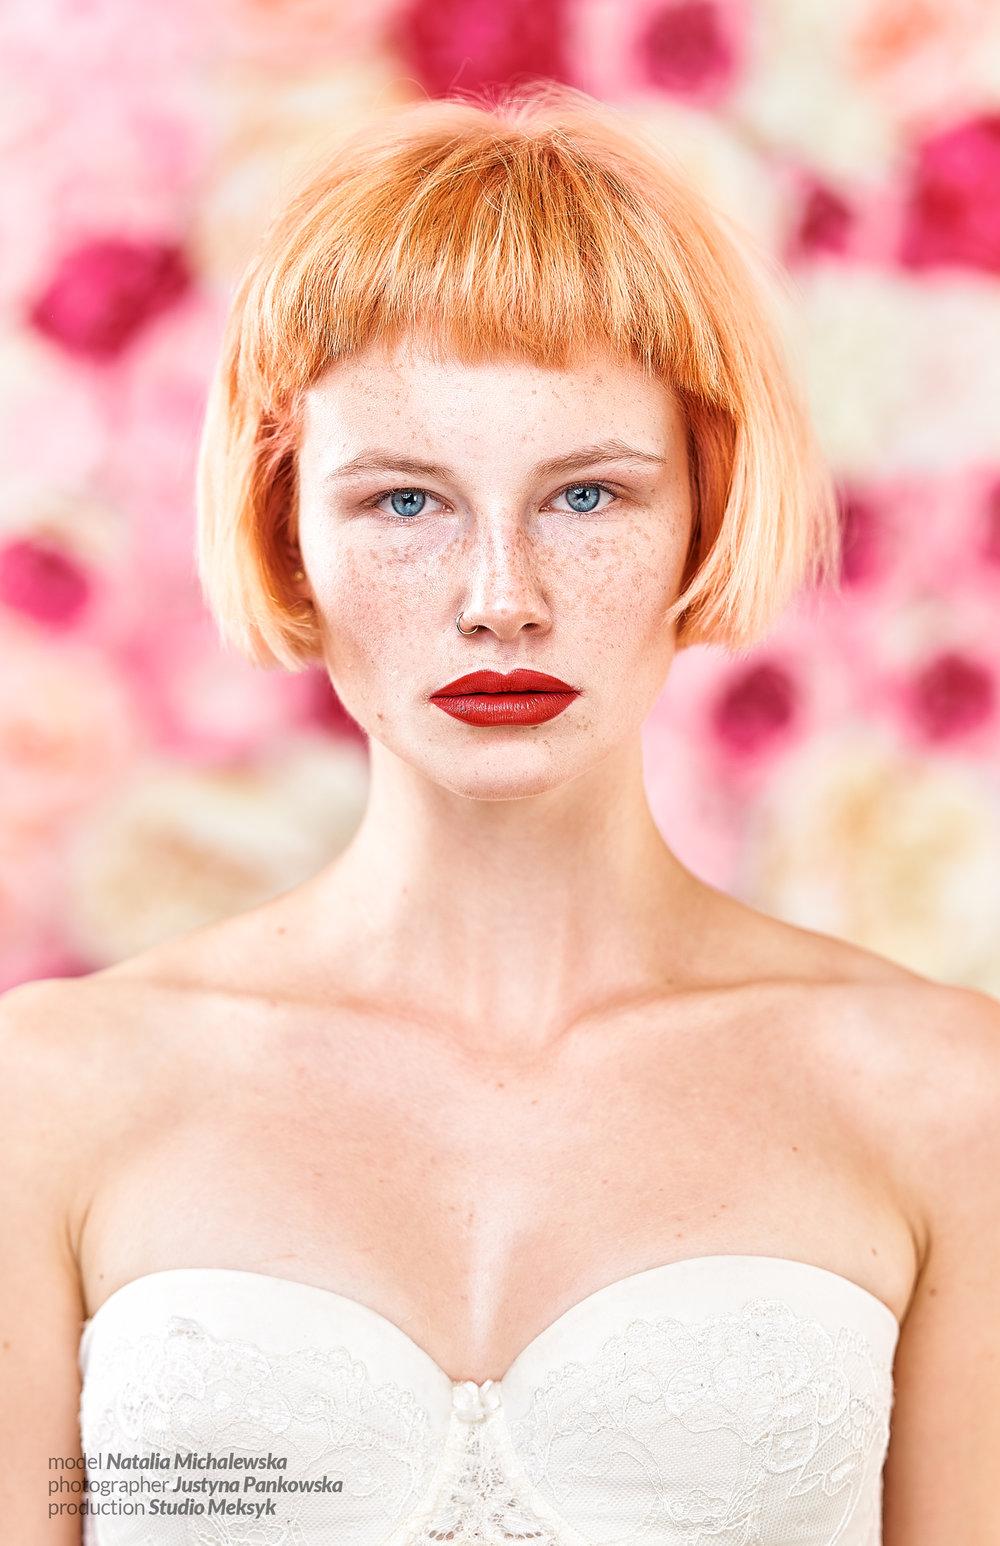 Natalia Michalewska, rose, glamour, warszawa, zdjęcia, beauty, girl, freckles, natural, portrait, pro, retouch, photography, D4s, nikkor 105 macro, Justyna Pankowska, Studio Meksyk,3.jpg